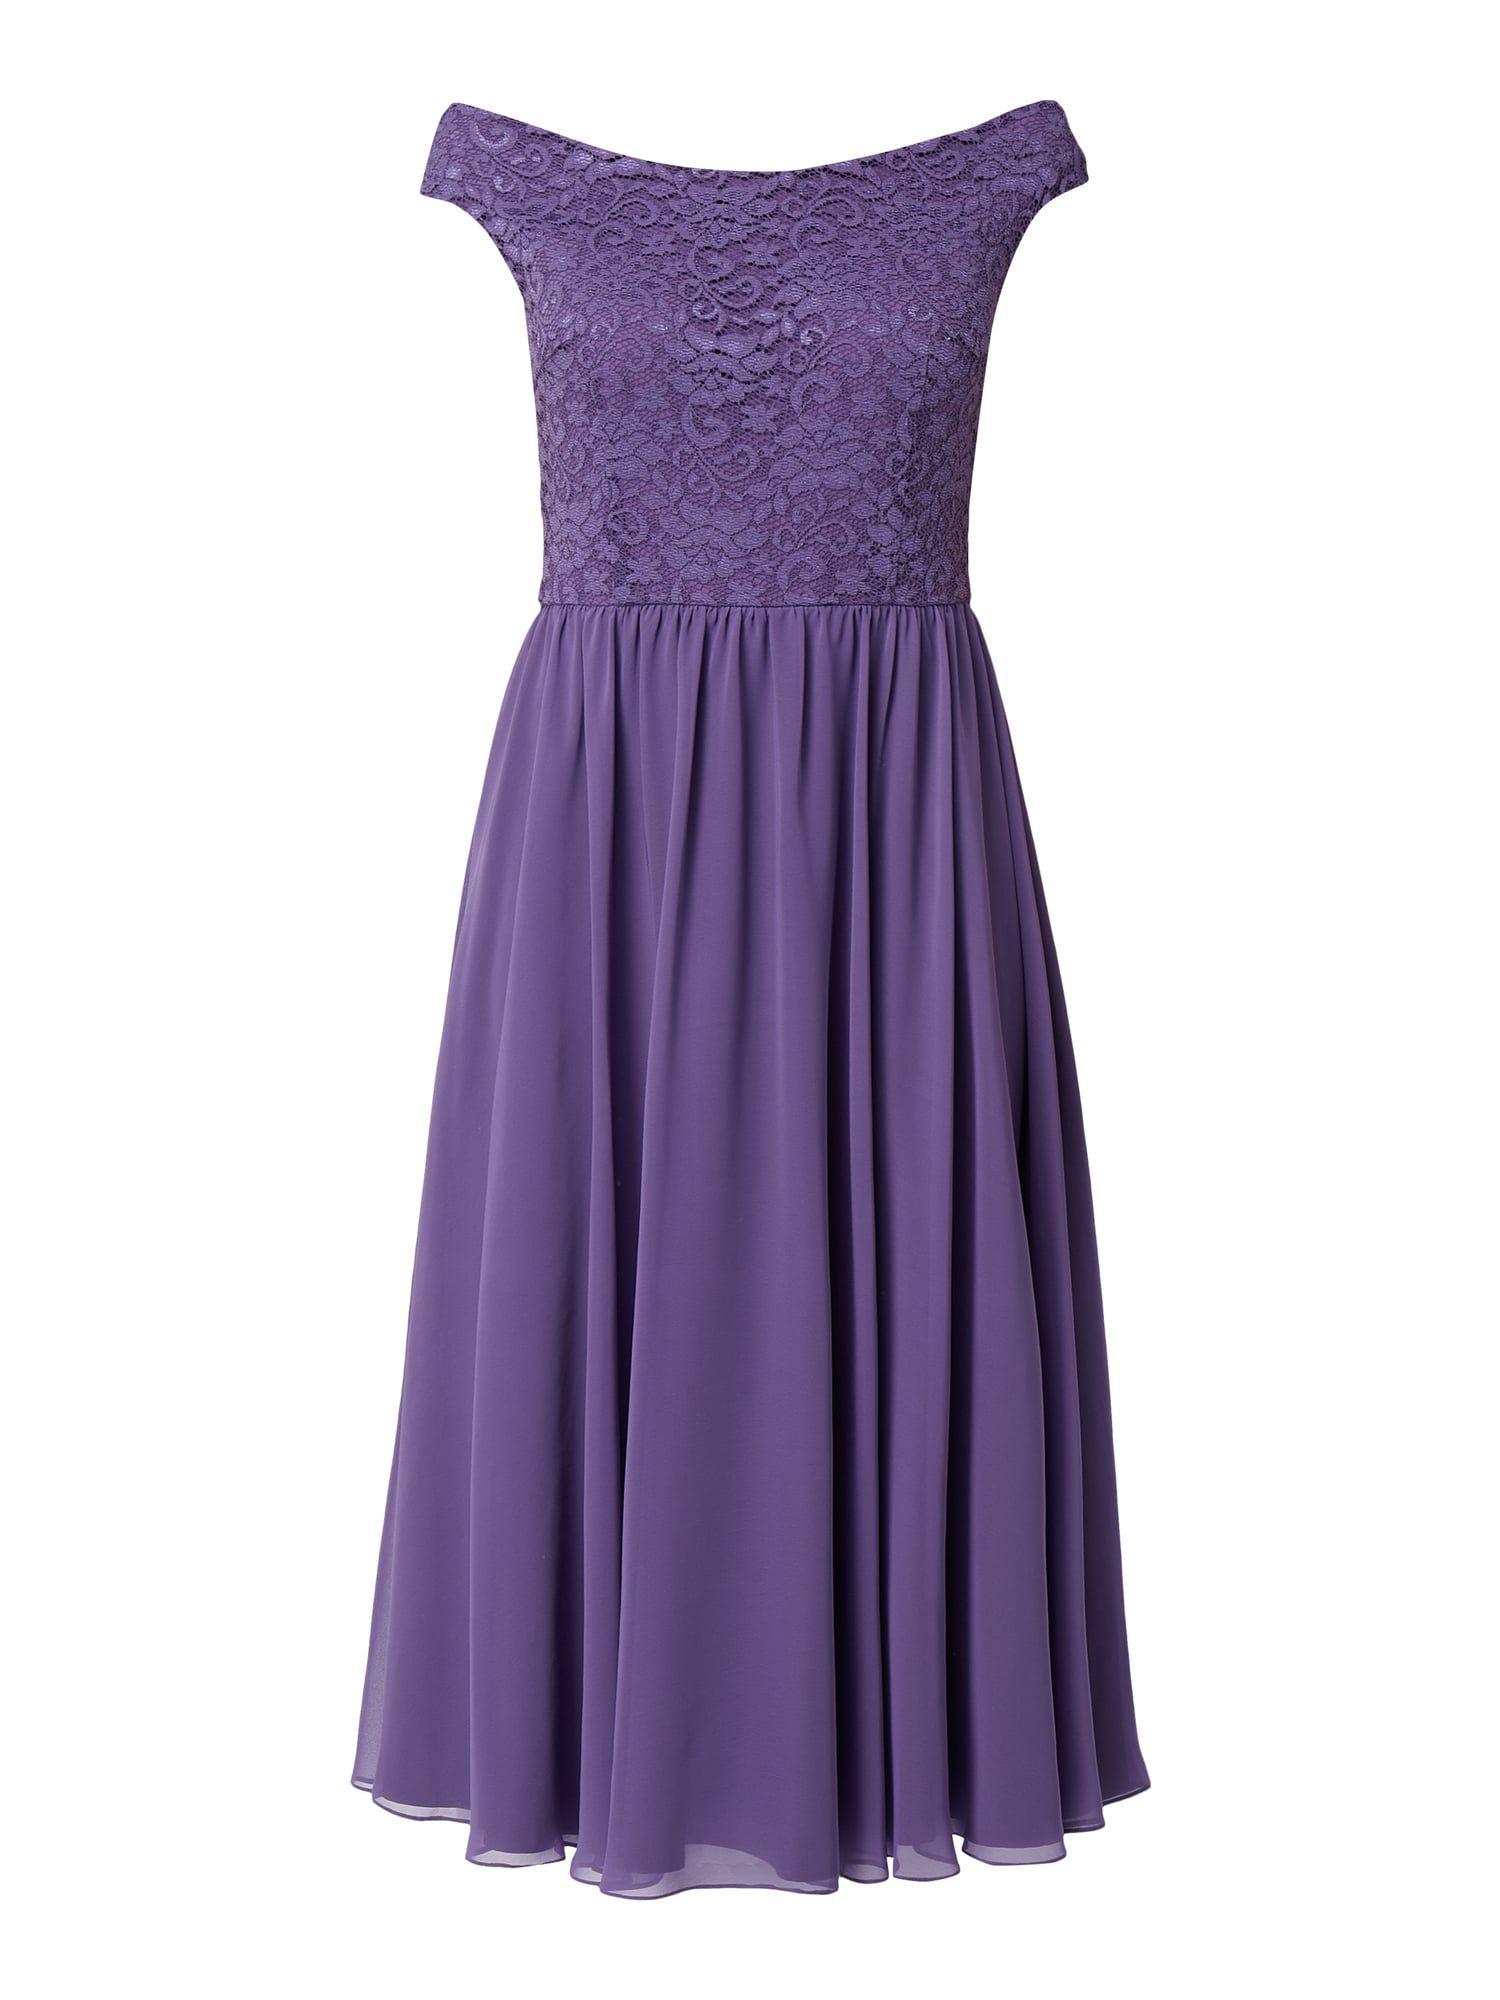 Top Abendkleider Bei P&C Spezialgebiet20 Coolste Abendkleider Bei P&C Ärmel